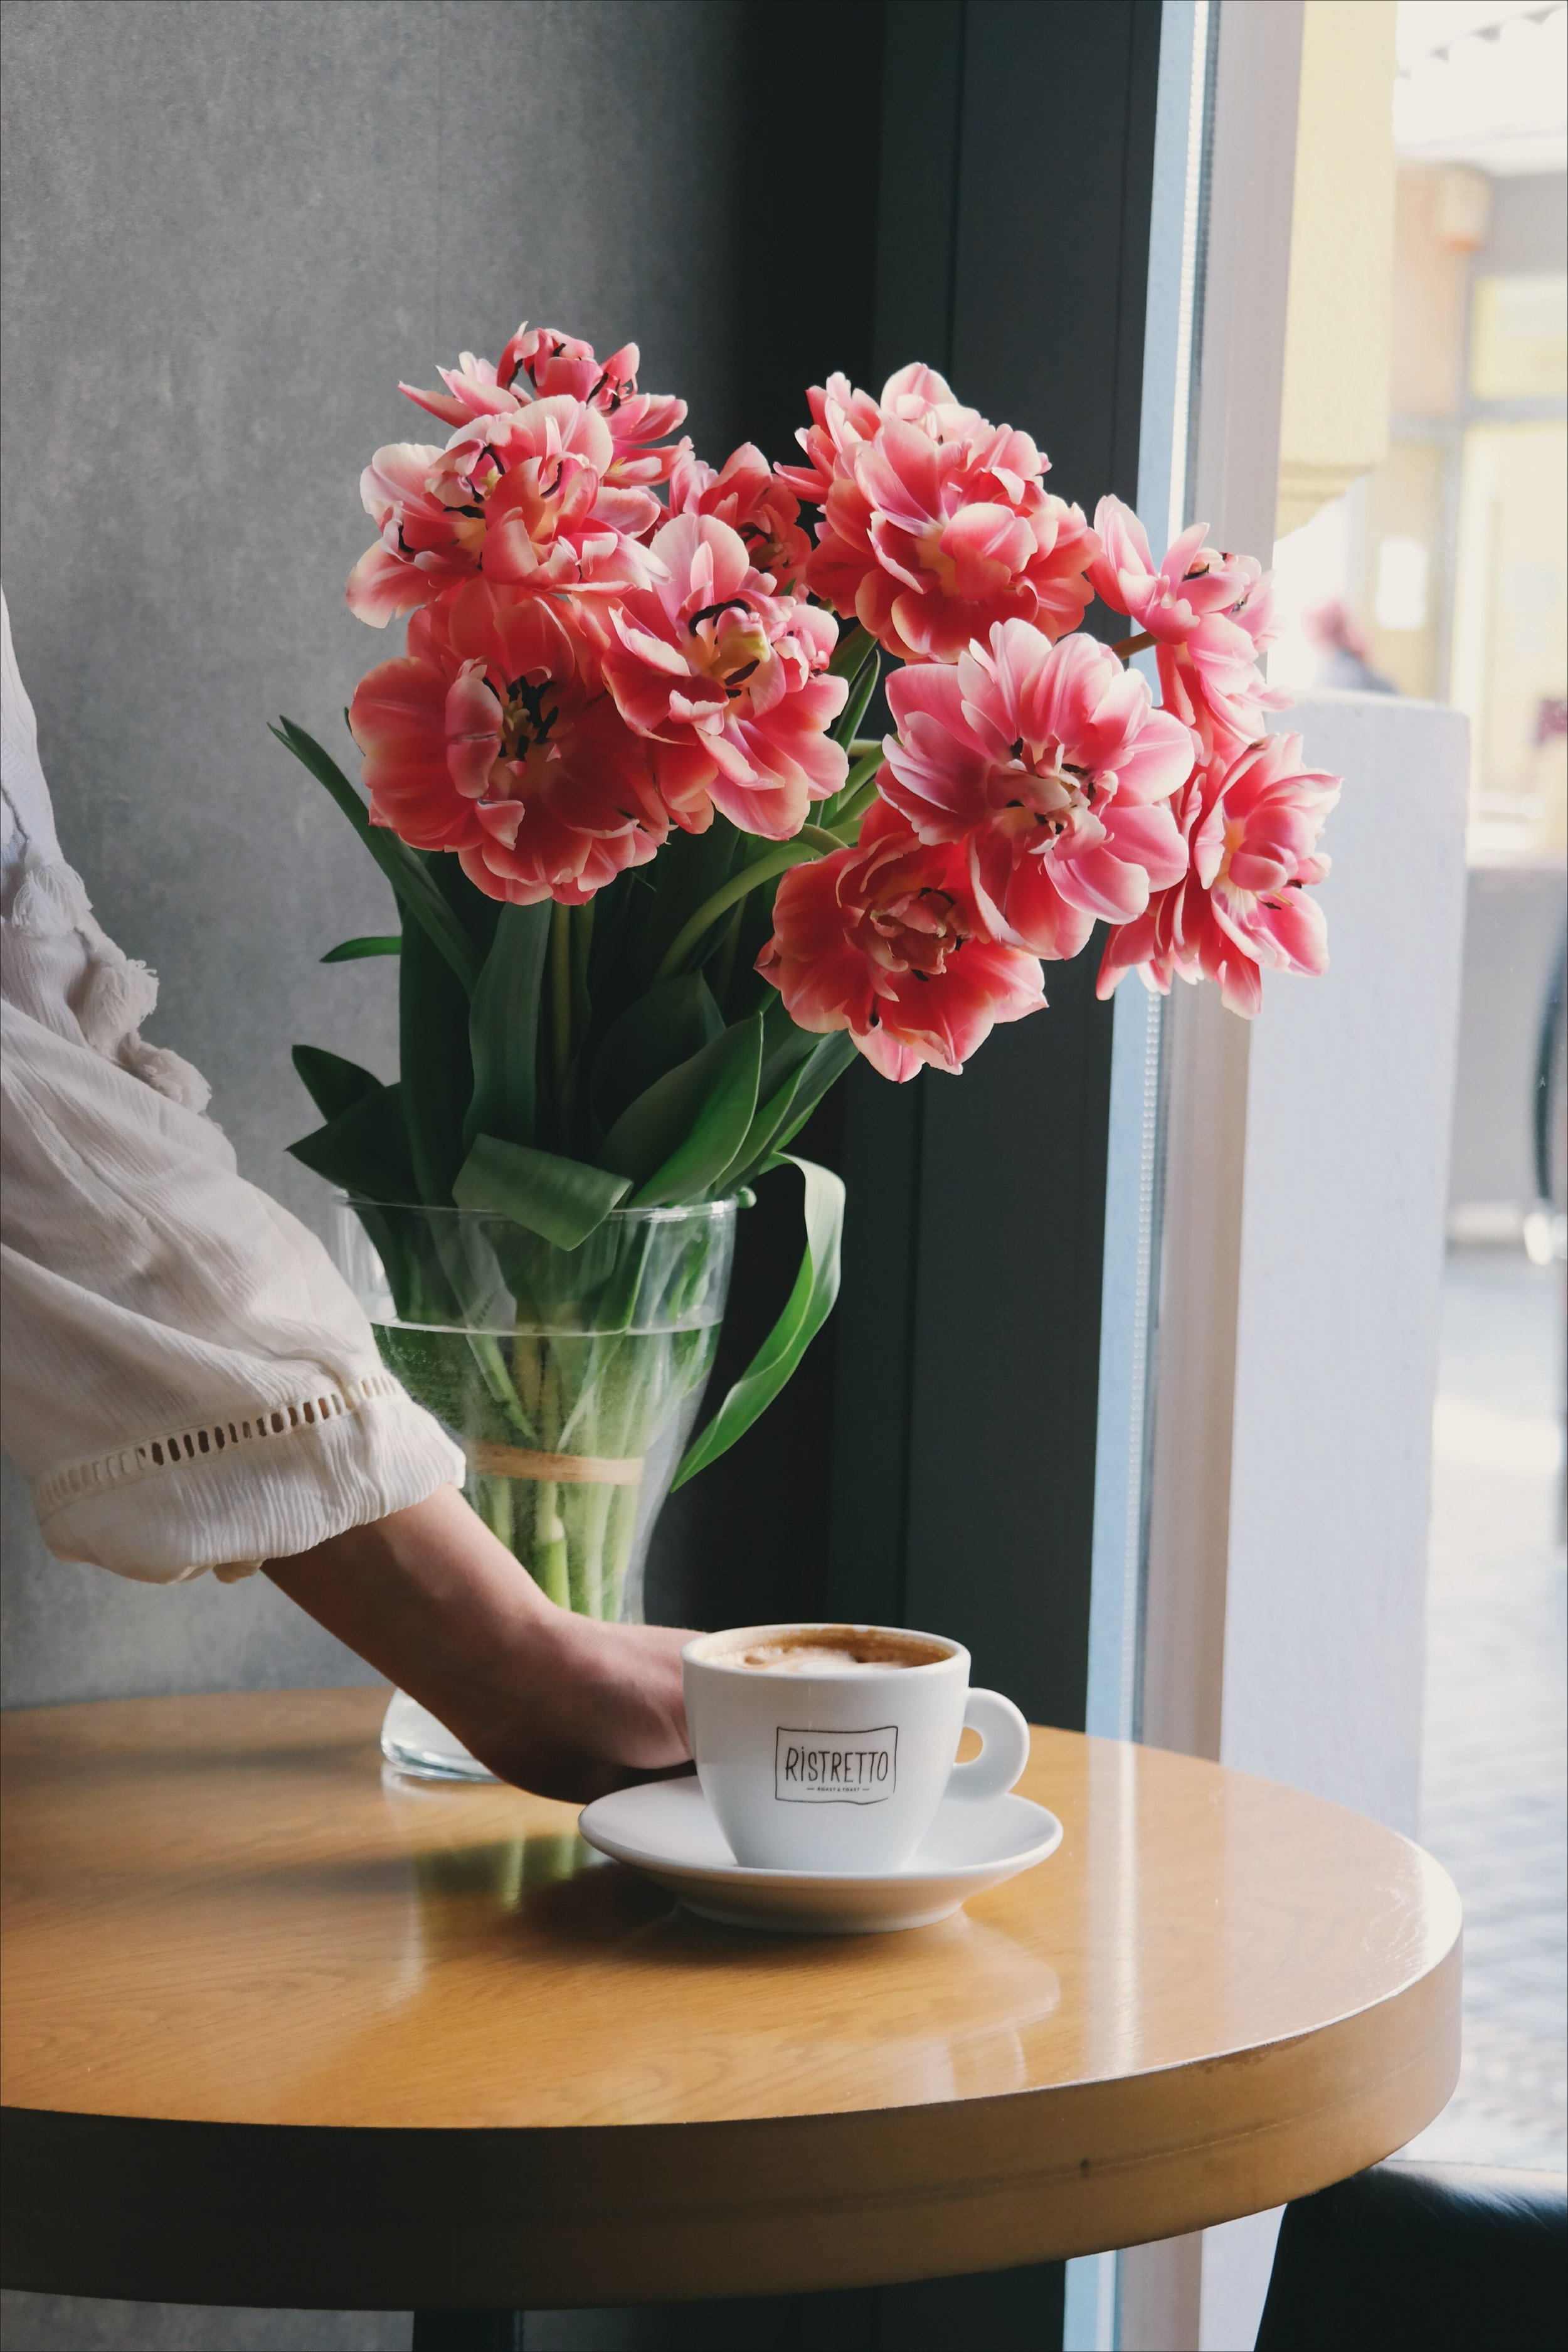 bouquet-bright-coffee-378006.jpg